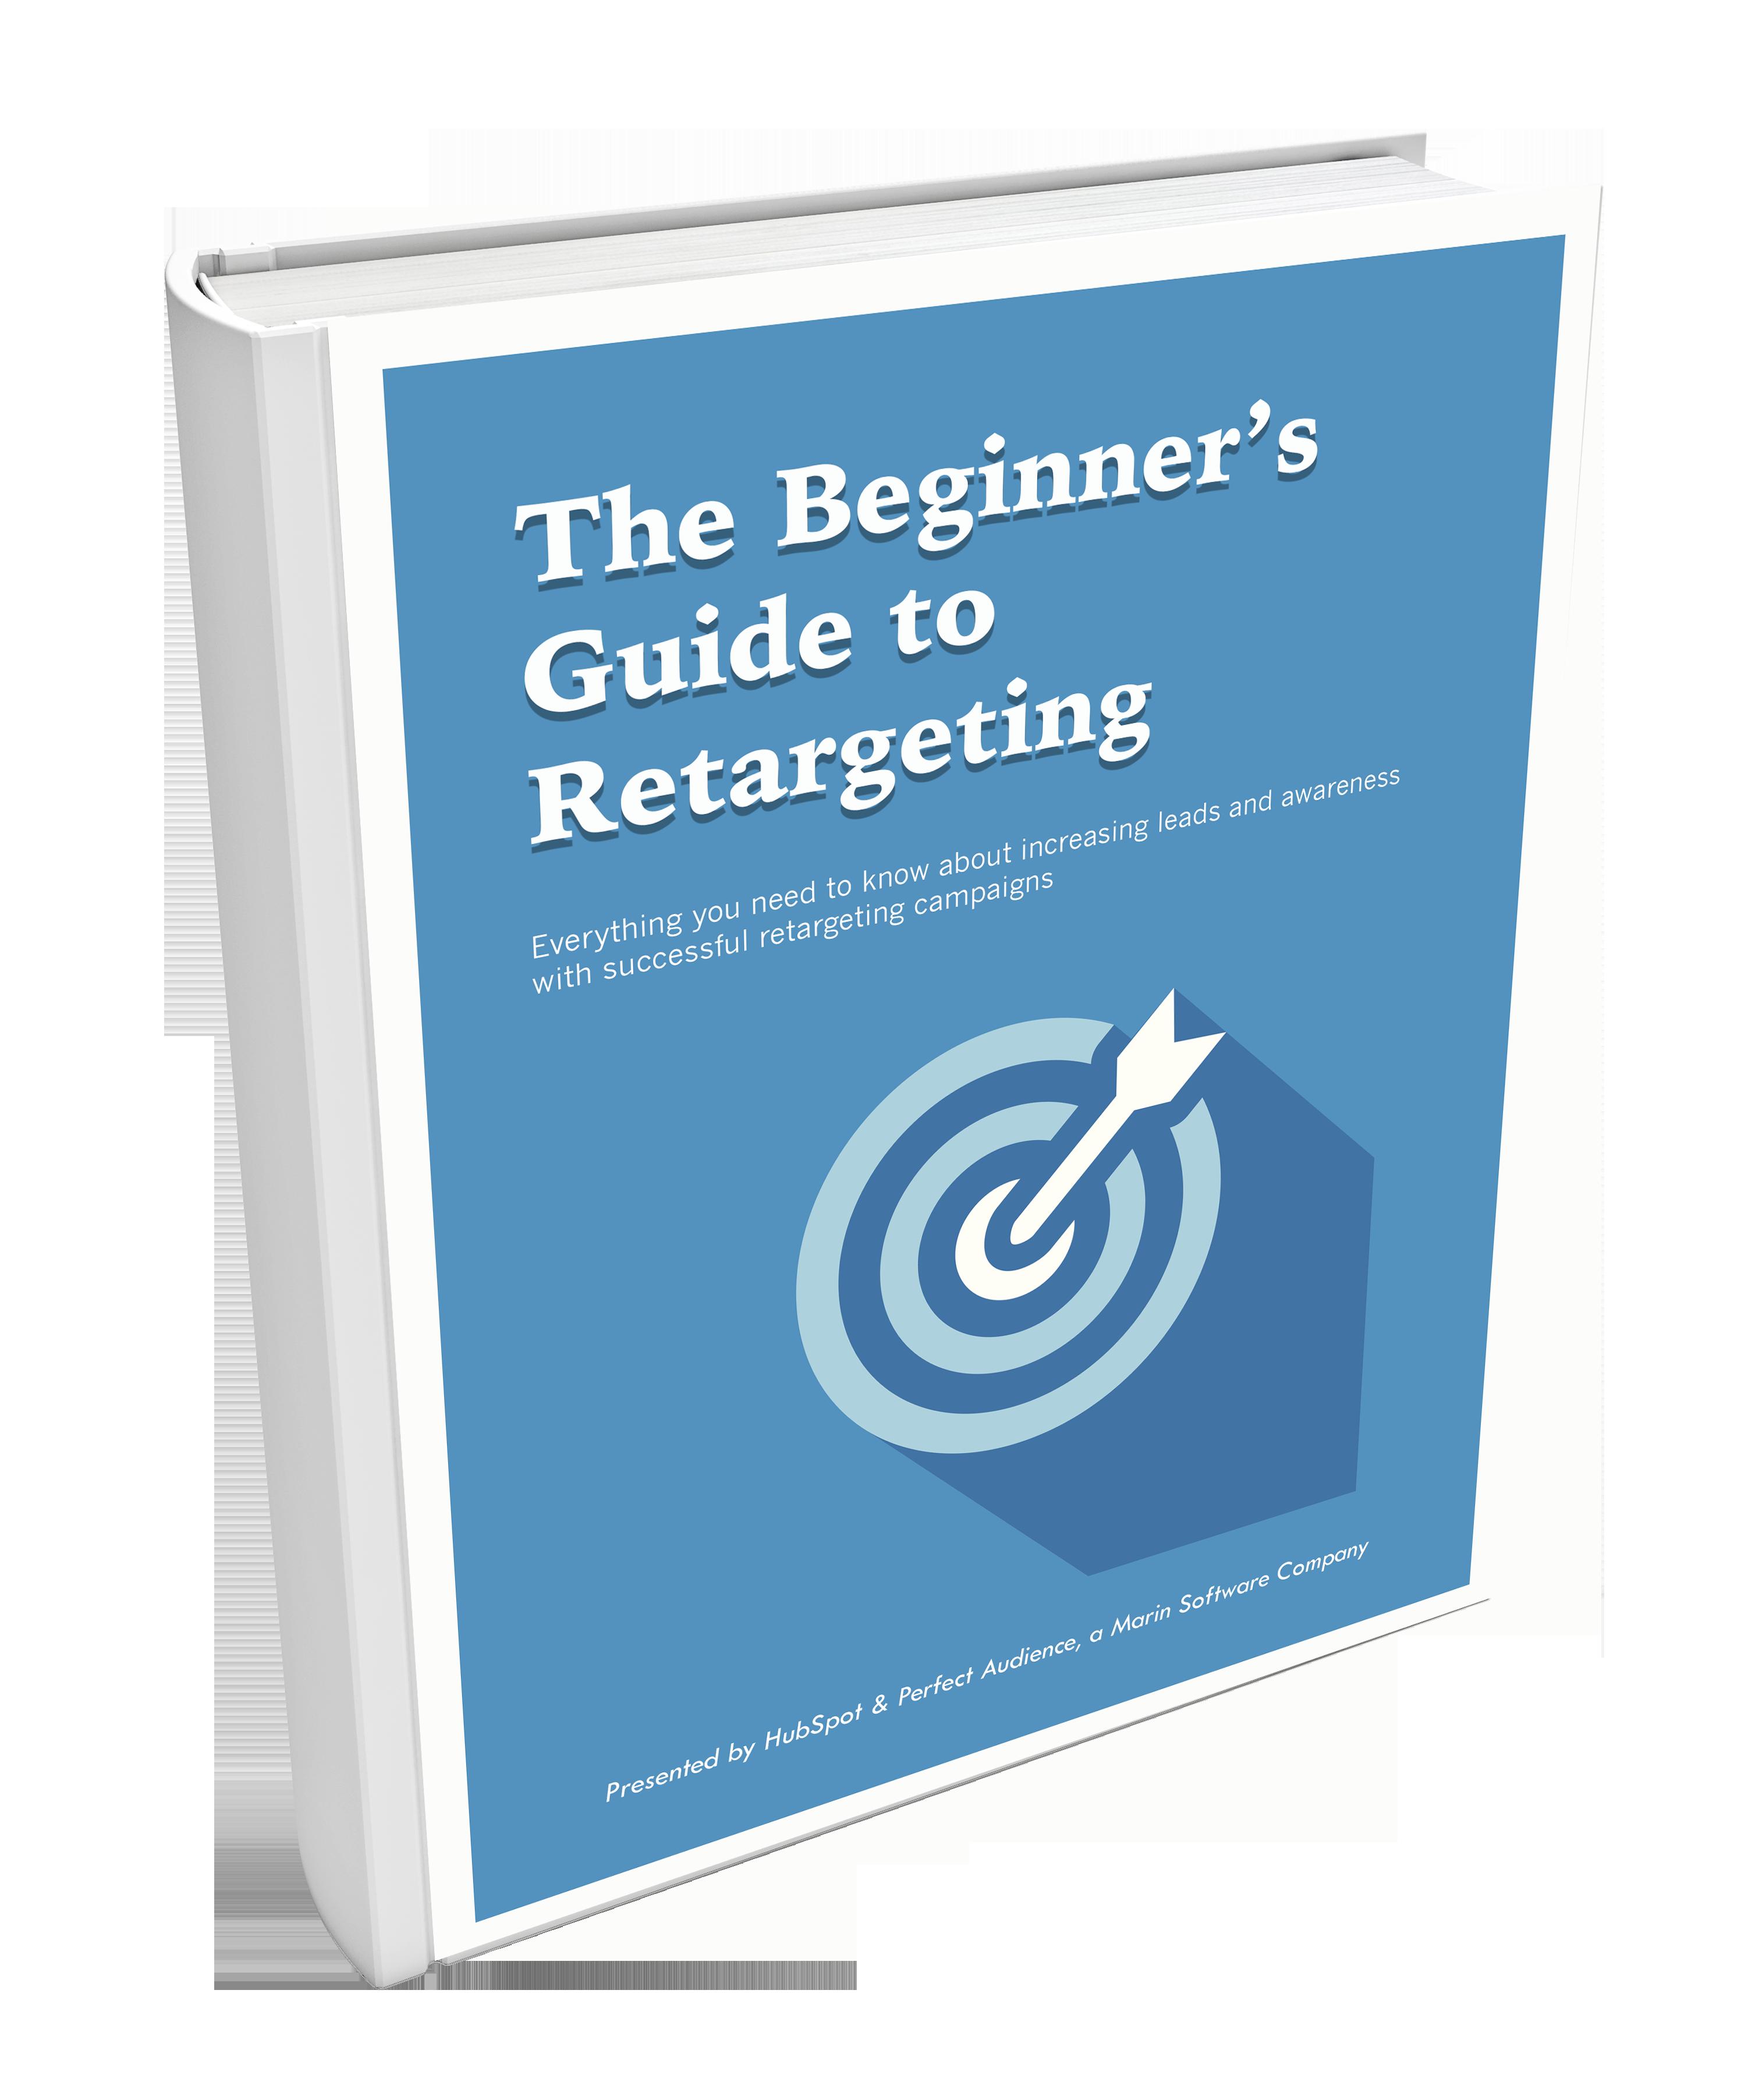 Beginner's Guide to Retargeting